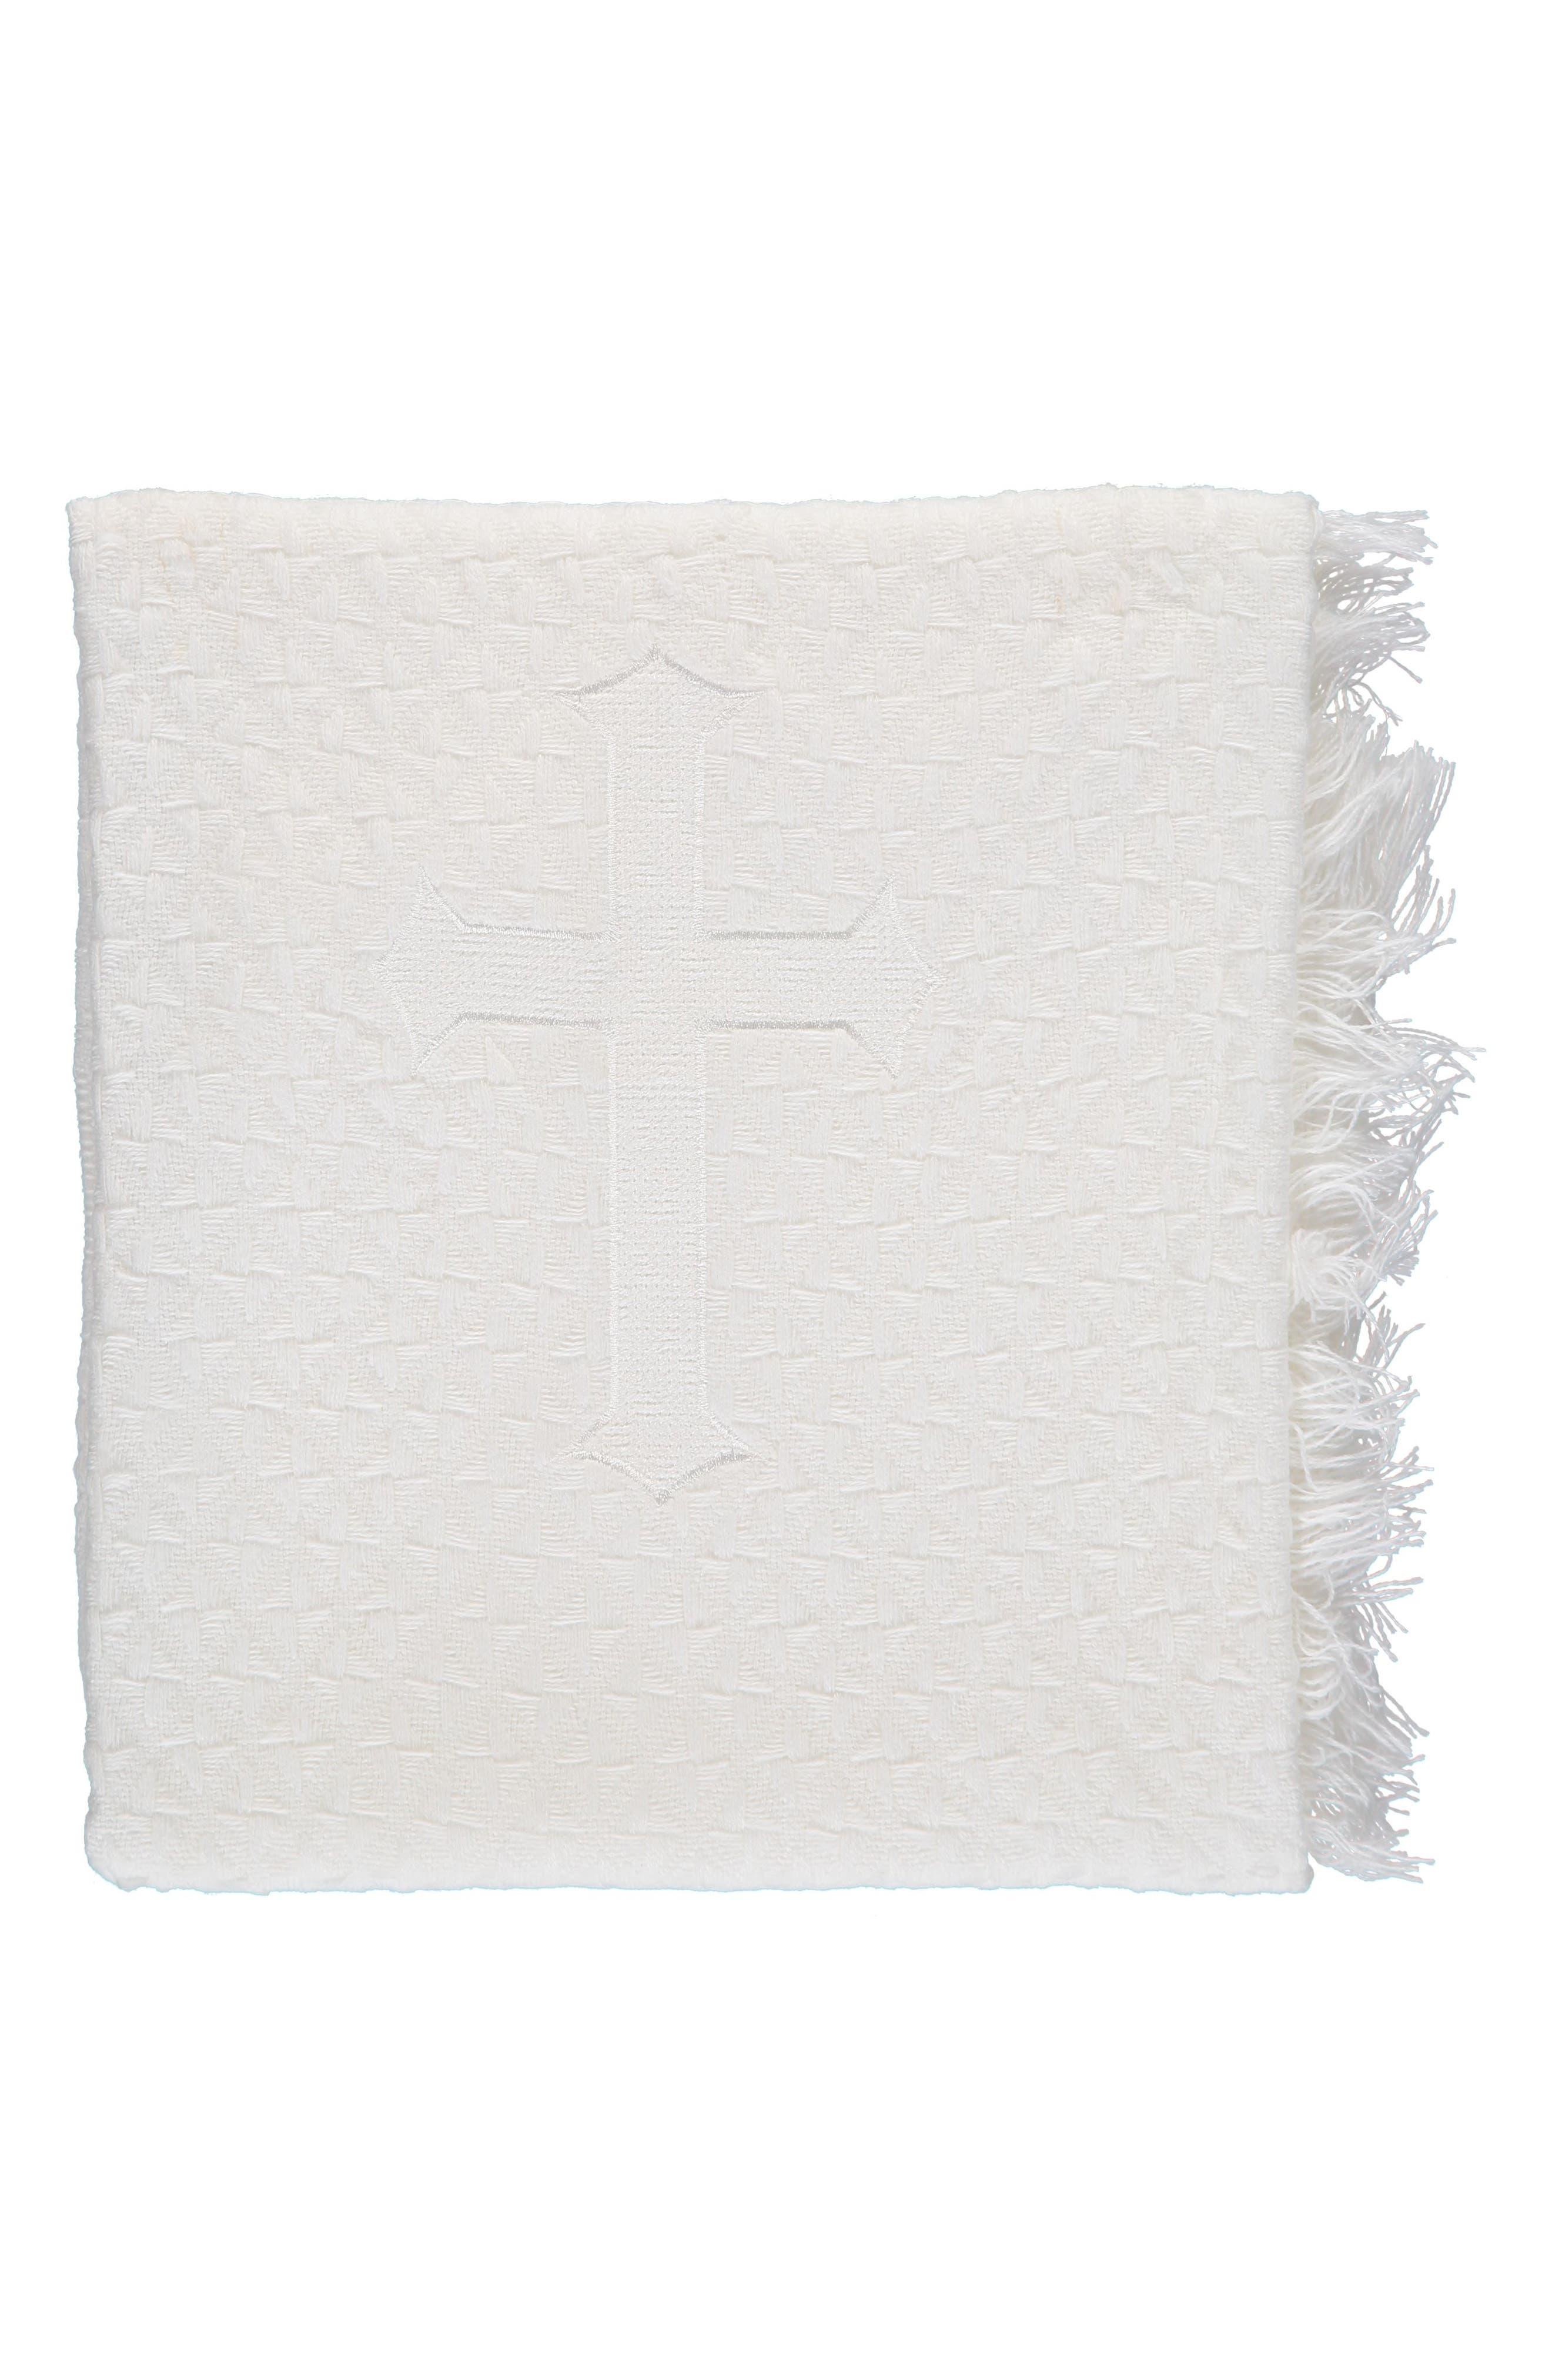 Christening Blanket,                         Main,                         color, 100